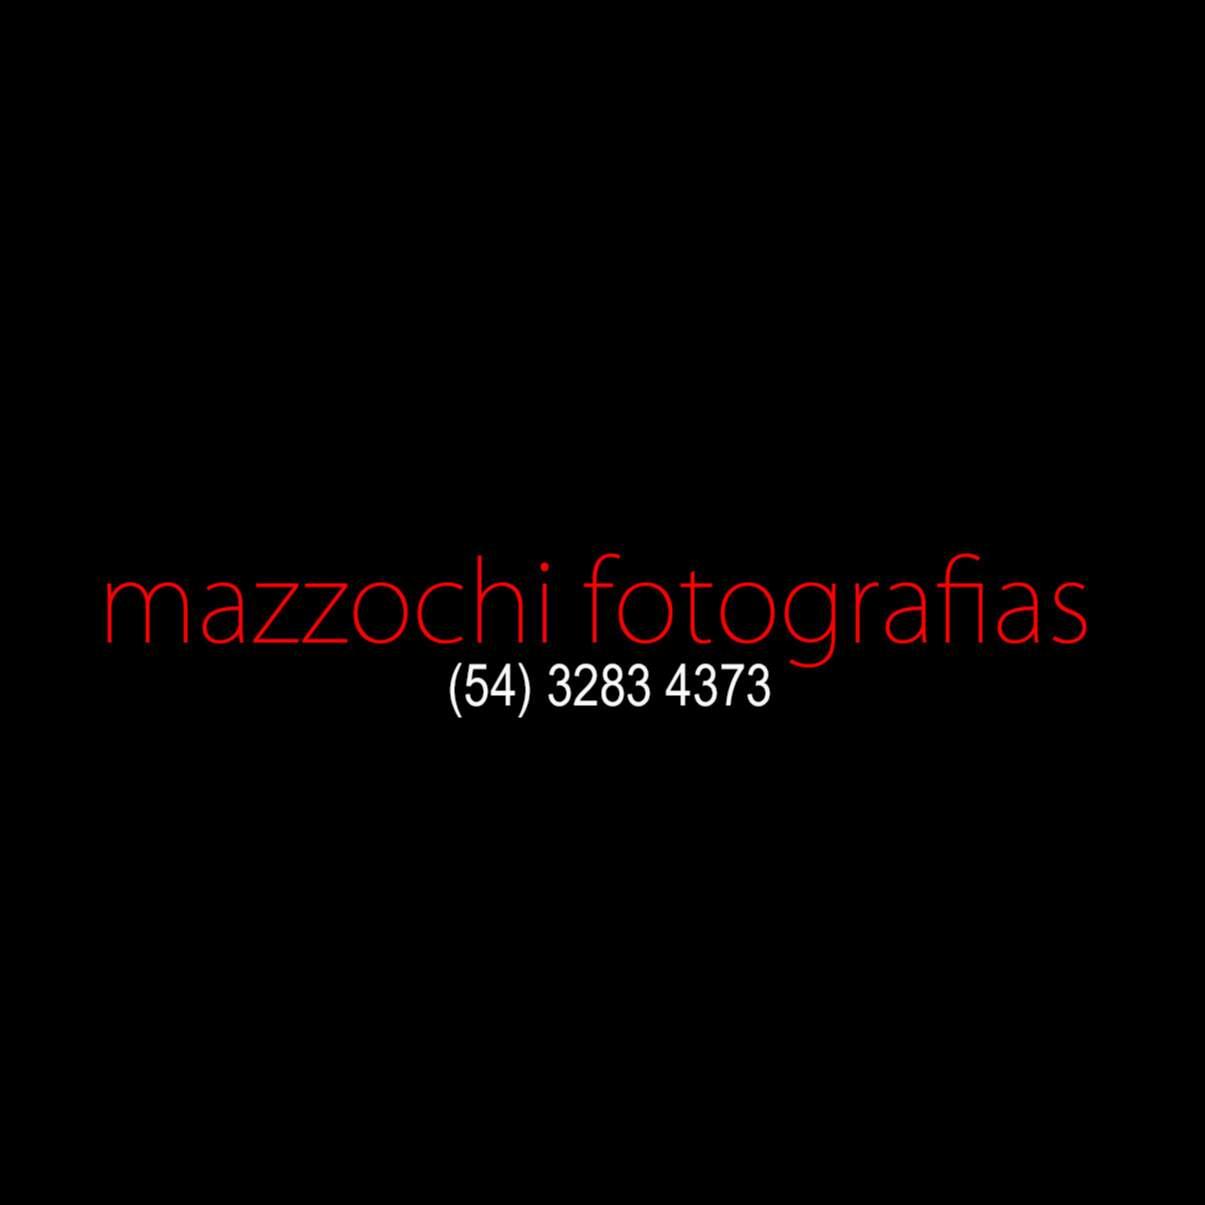 Logo Mazzochi Fotografias